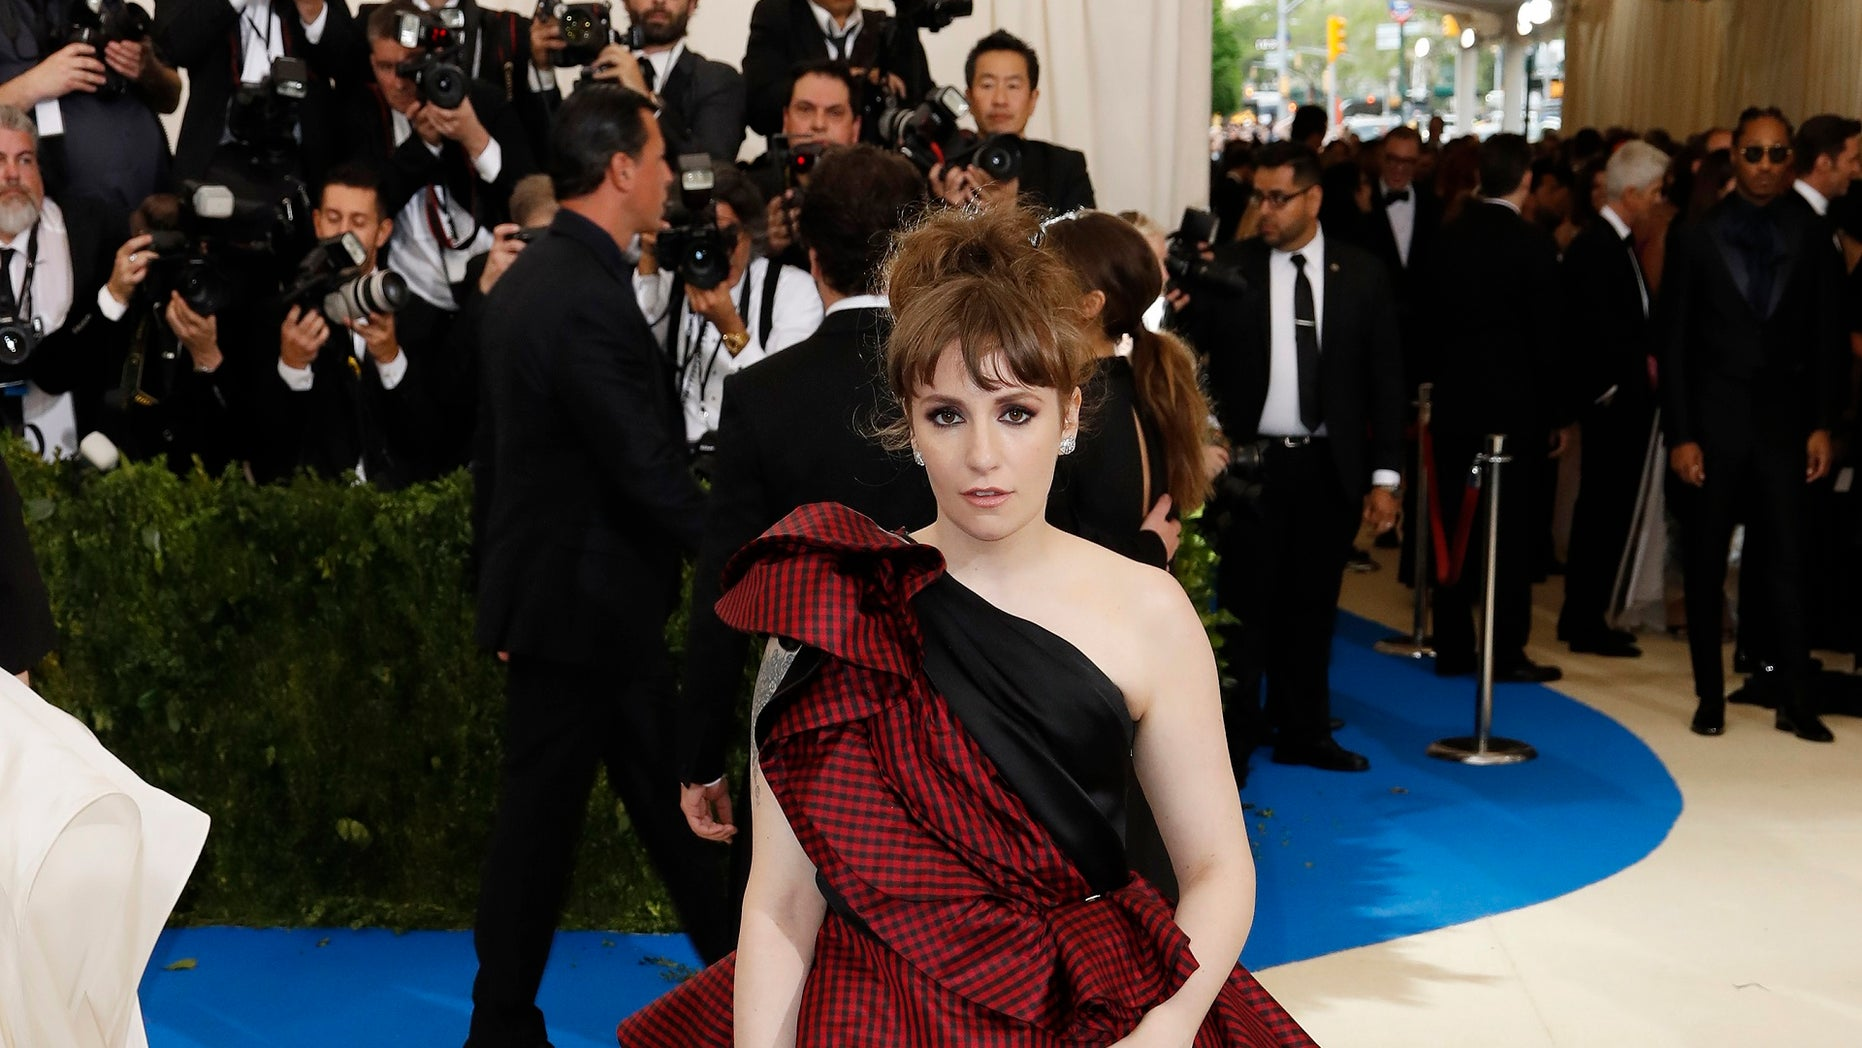 Metropolitan Museum of Art Costume Institute Gala - Rei Kawakubo/Comme des Garcons: Art of the In-Between - Arrivals - New York City, U.S. - 01/05/17 - Lena Dunham. REUTERS/Lucas Jackson - HP1ED5200Y5LW